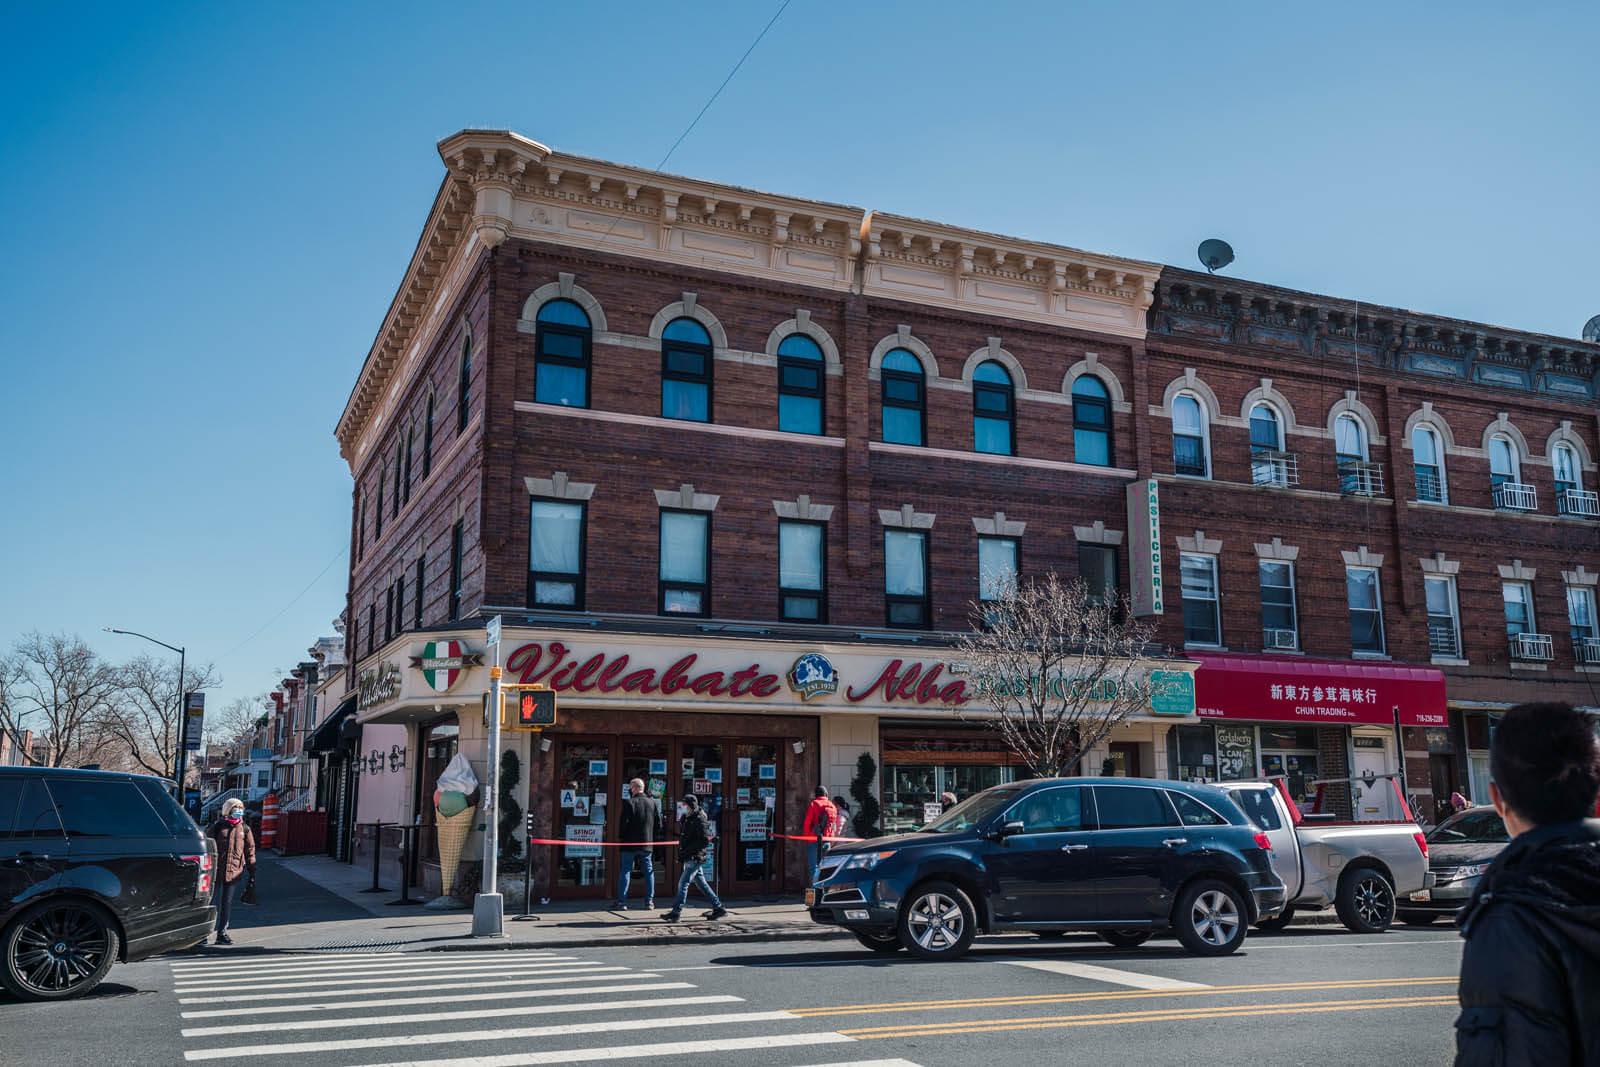 Villabate Alba bakery in Brooklyn in Bensonhurst